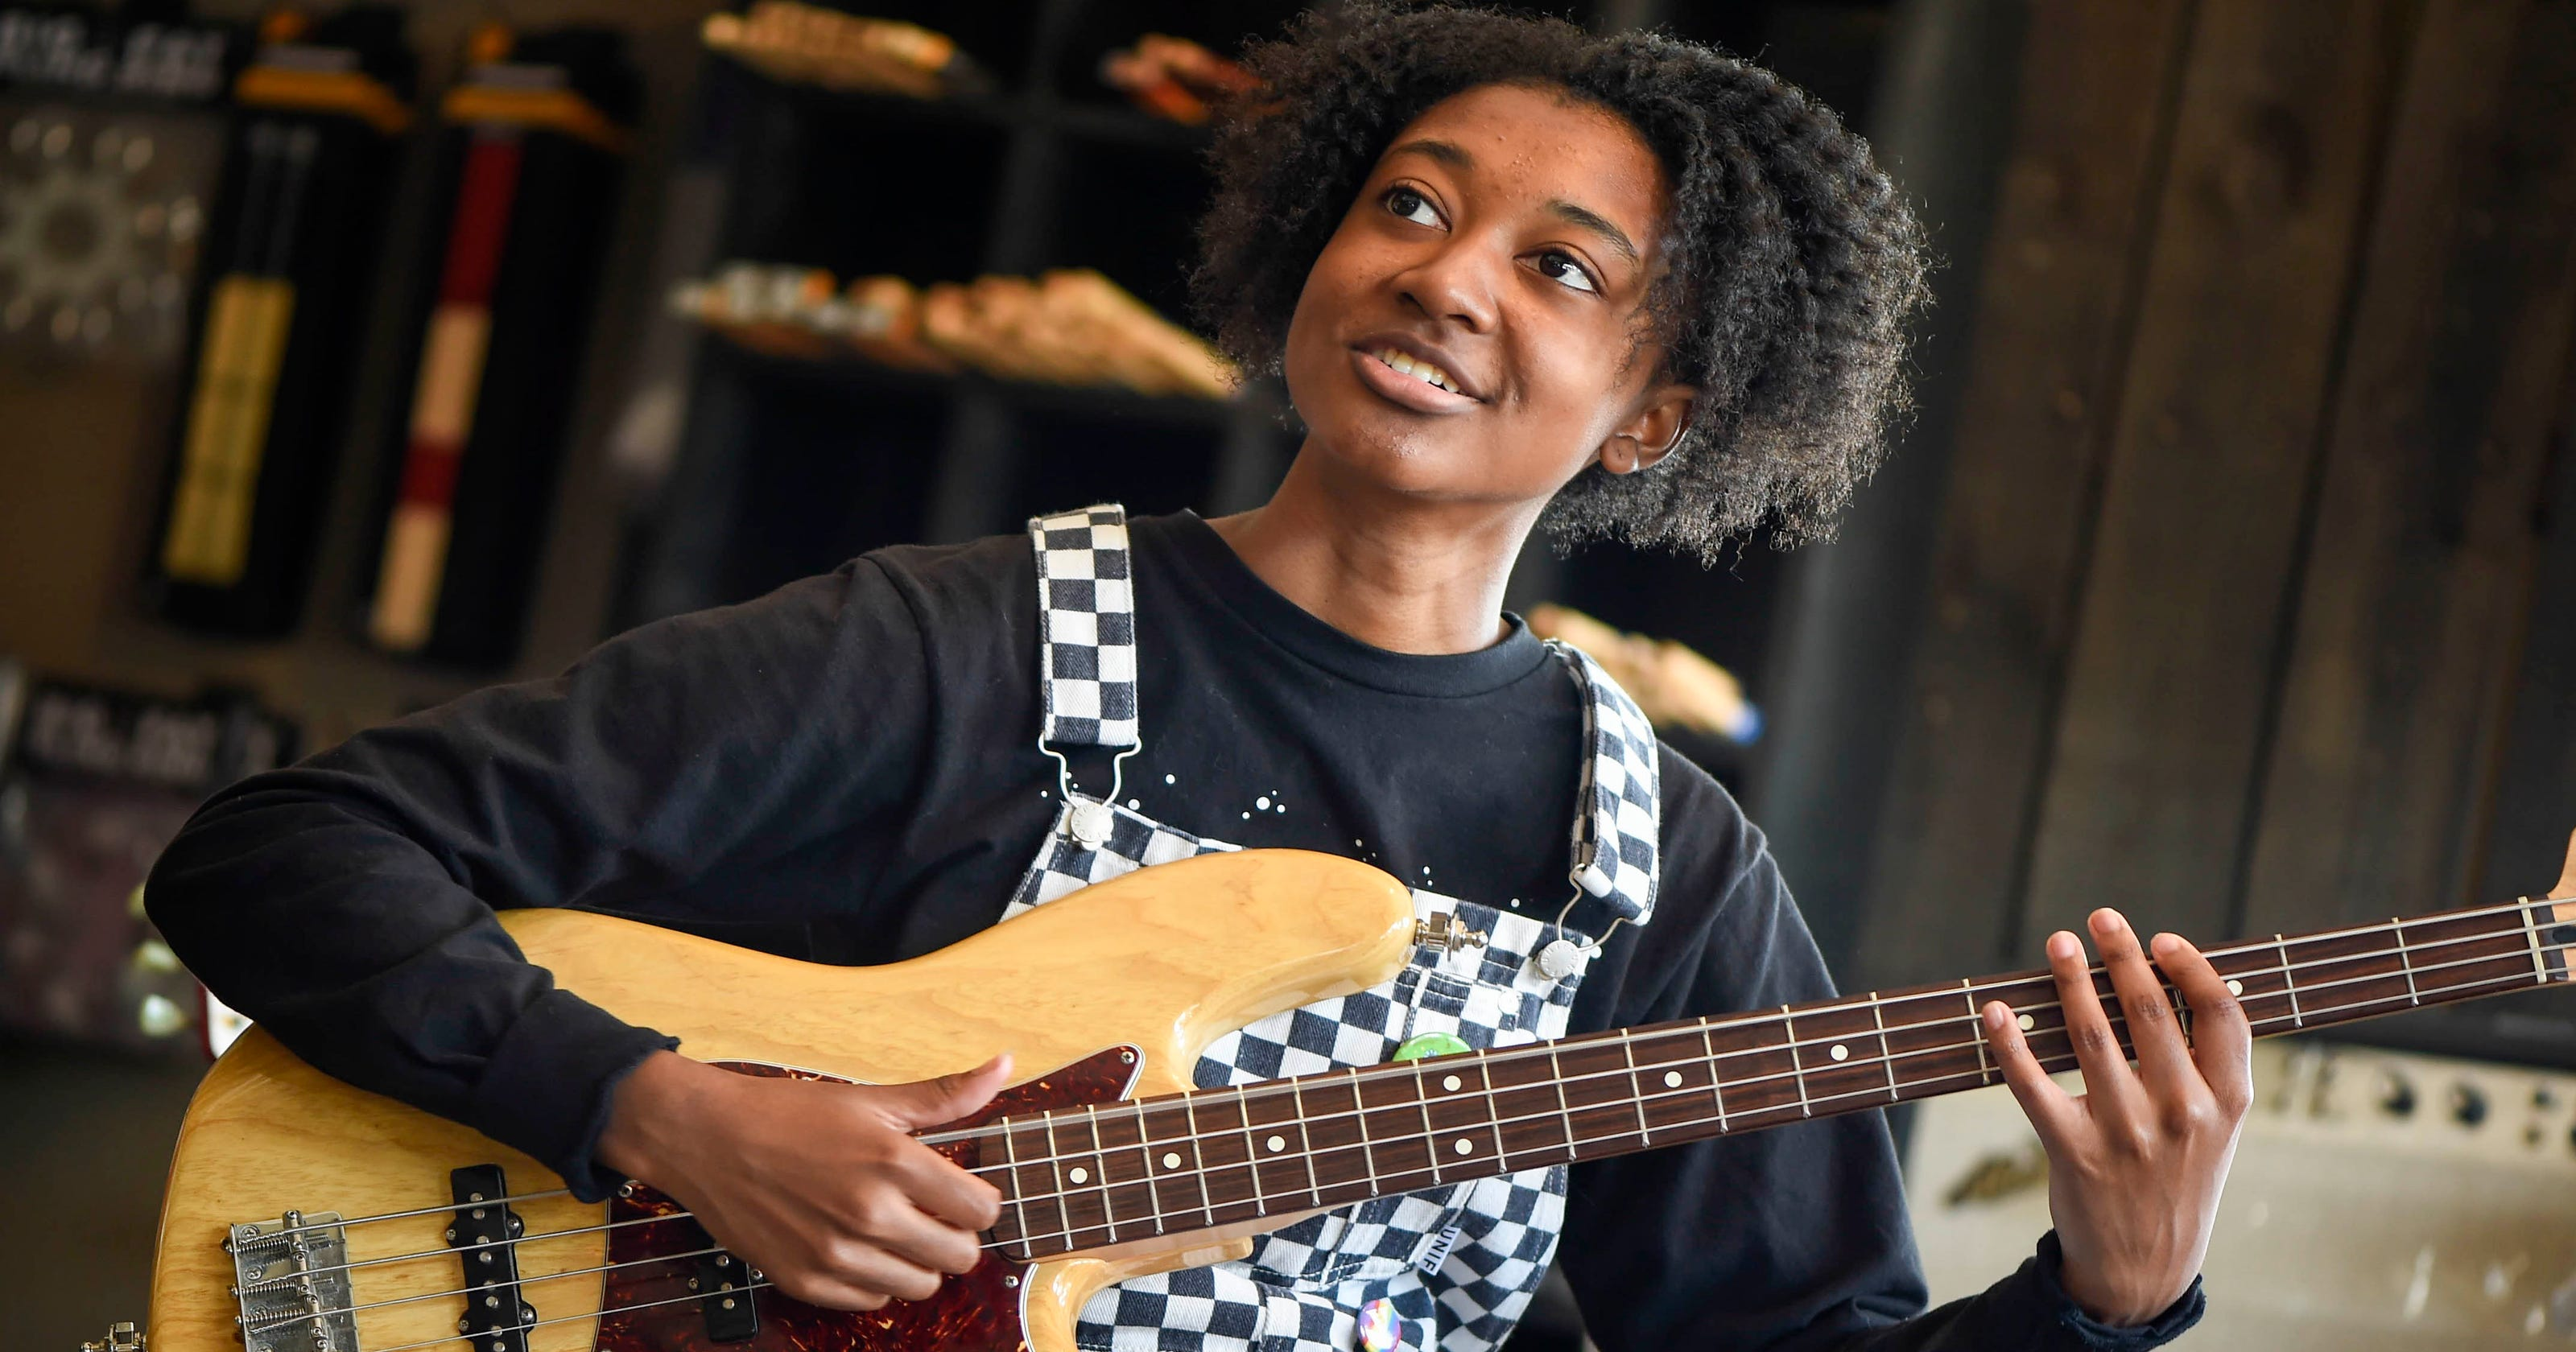 Meet Melanie Faye Nashvilles New Guitar Hero